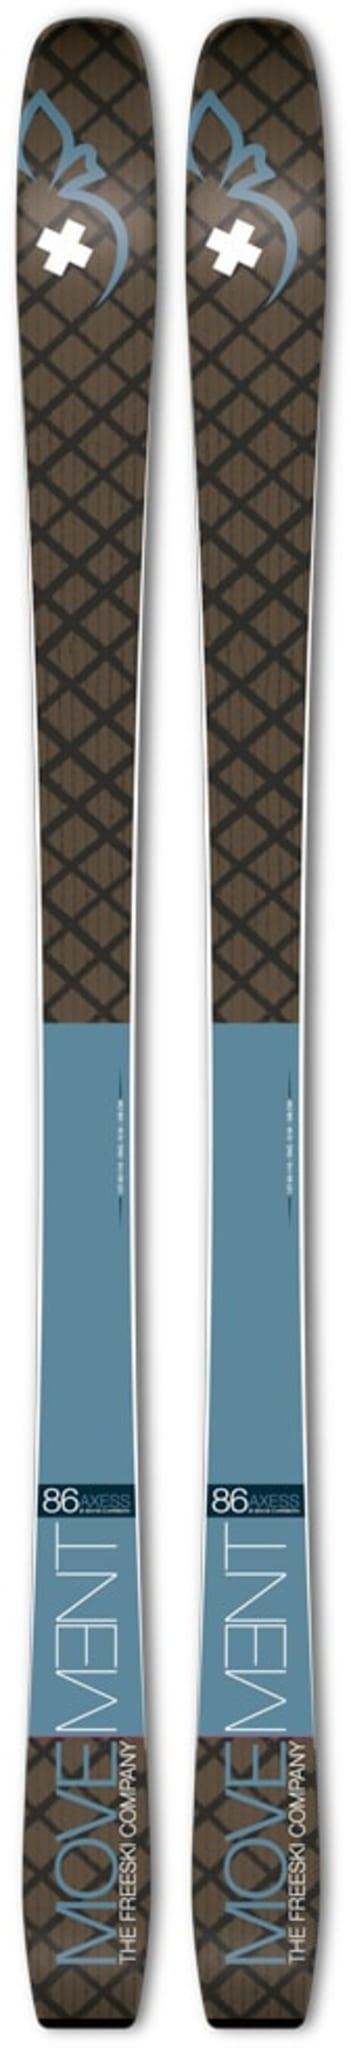 AXESS 86 & Marker Alpinist 12